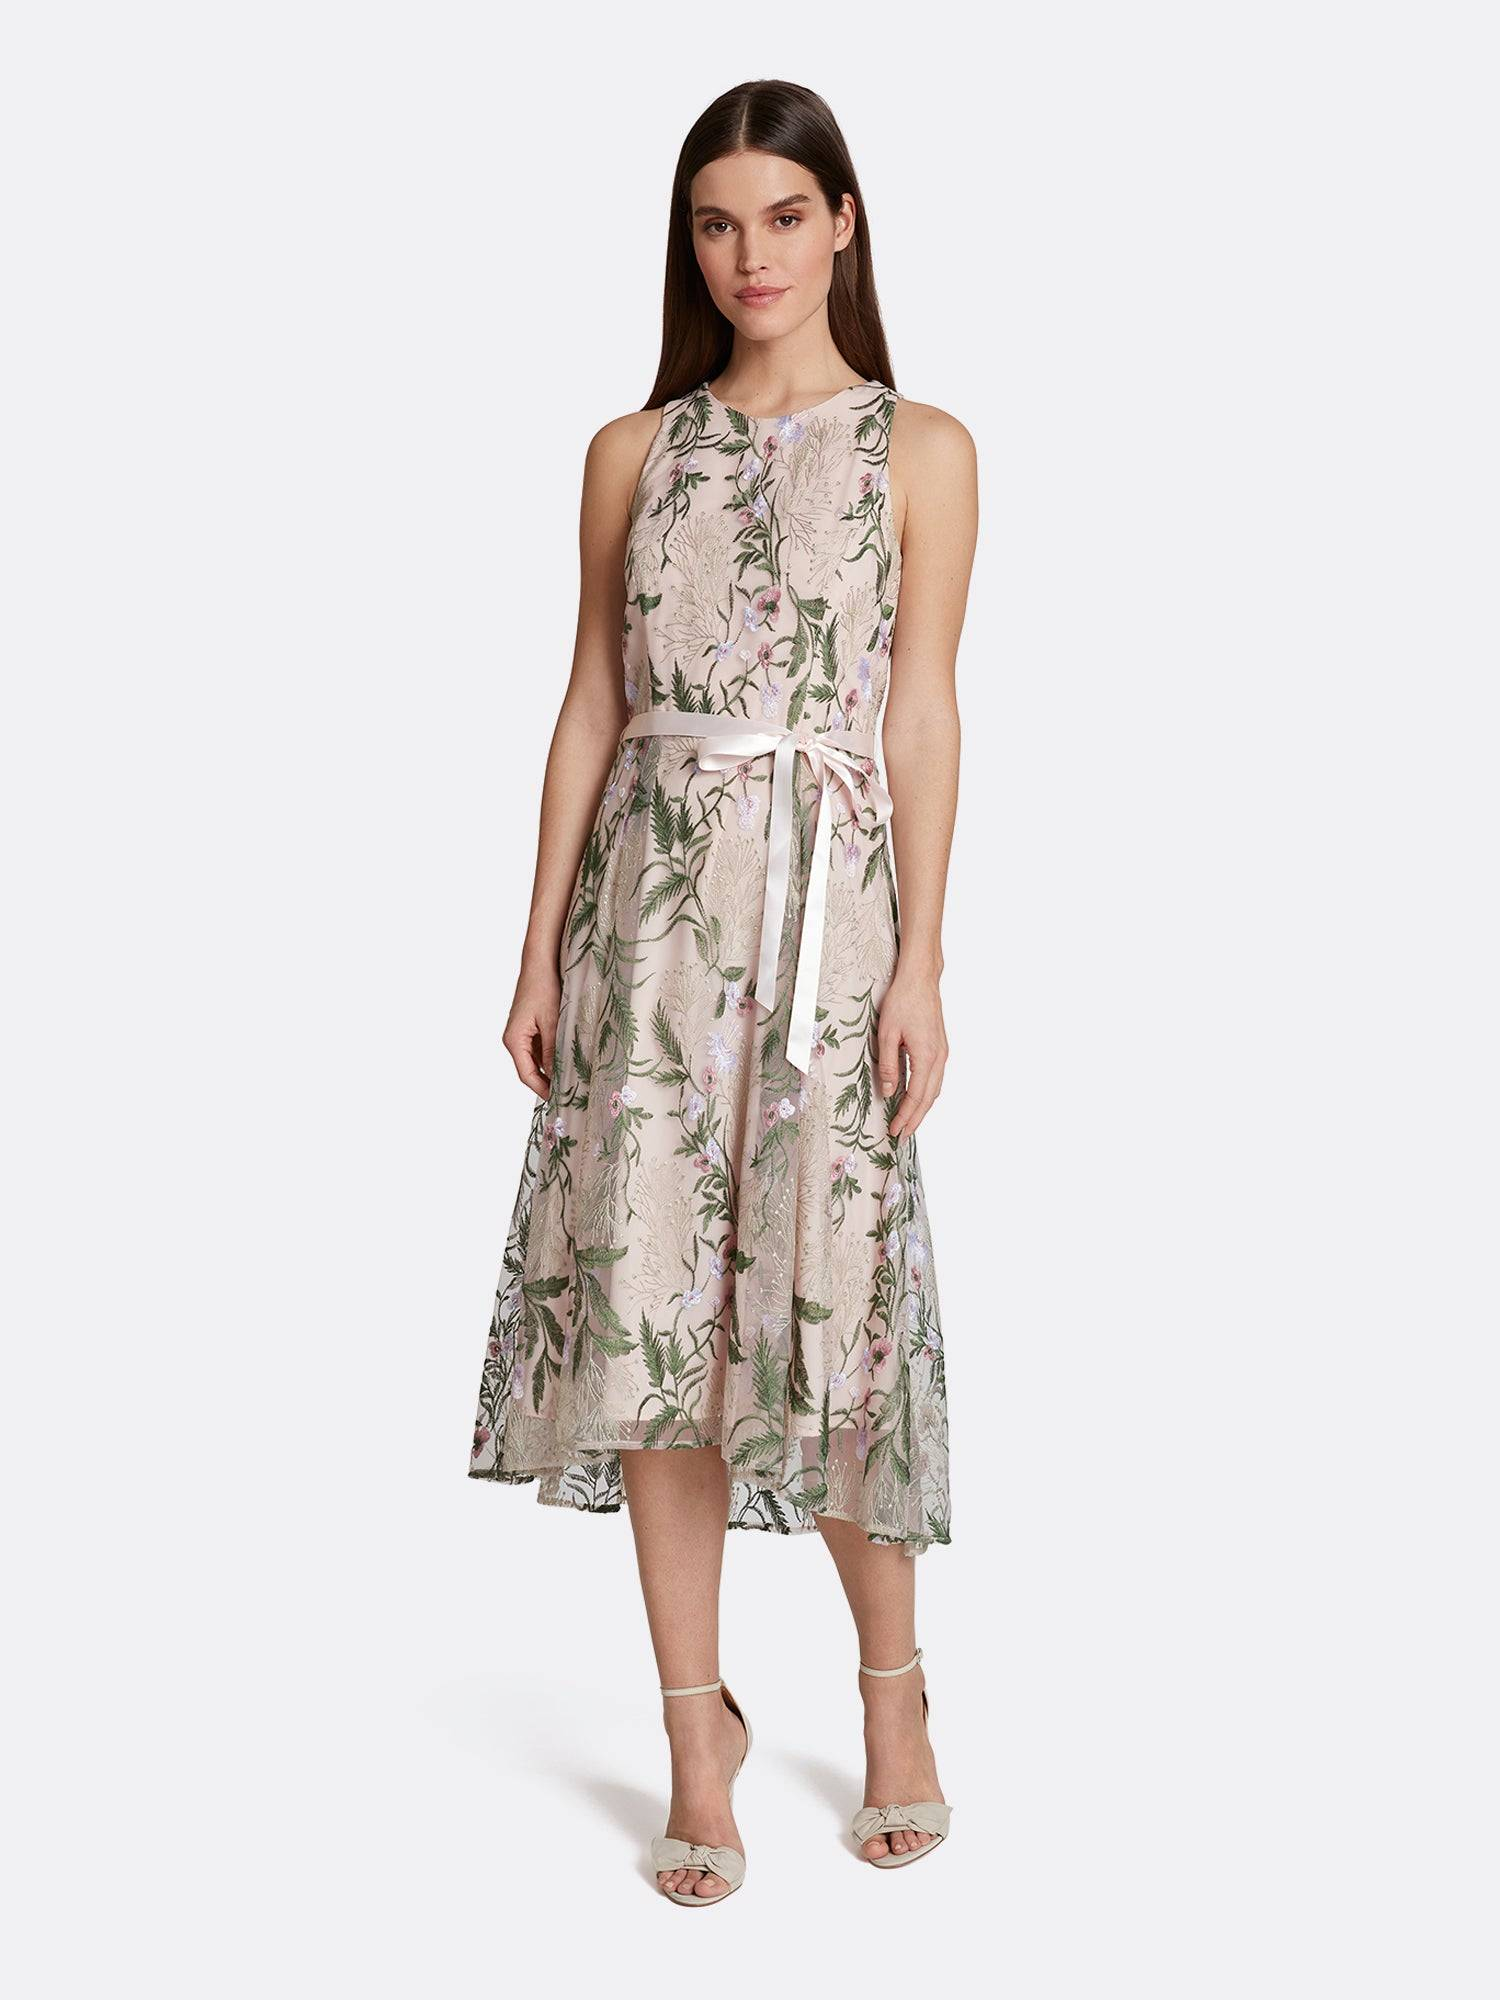 Tahari ASL Floral Embroidered Hi-Low Petite Dress Blush Multi Embroidery 10P